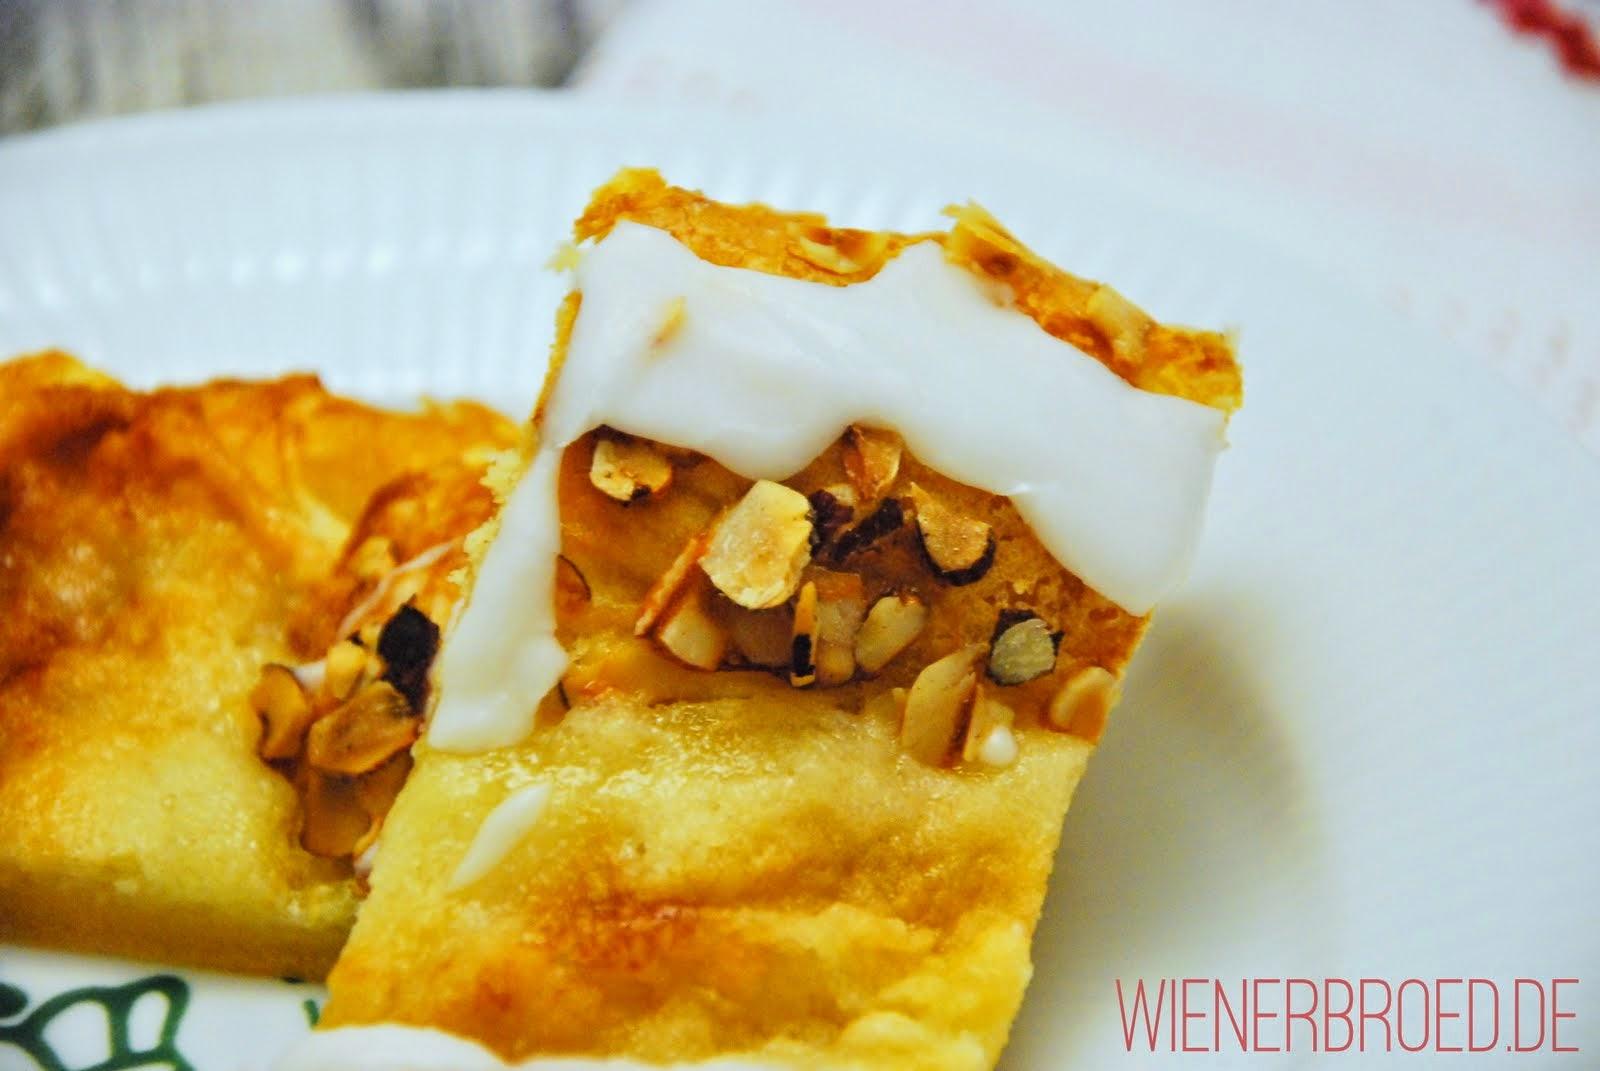 Wienerbroed - Danish pastry